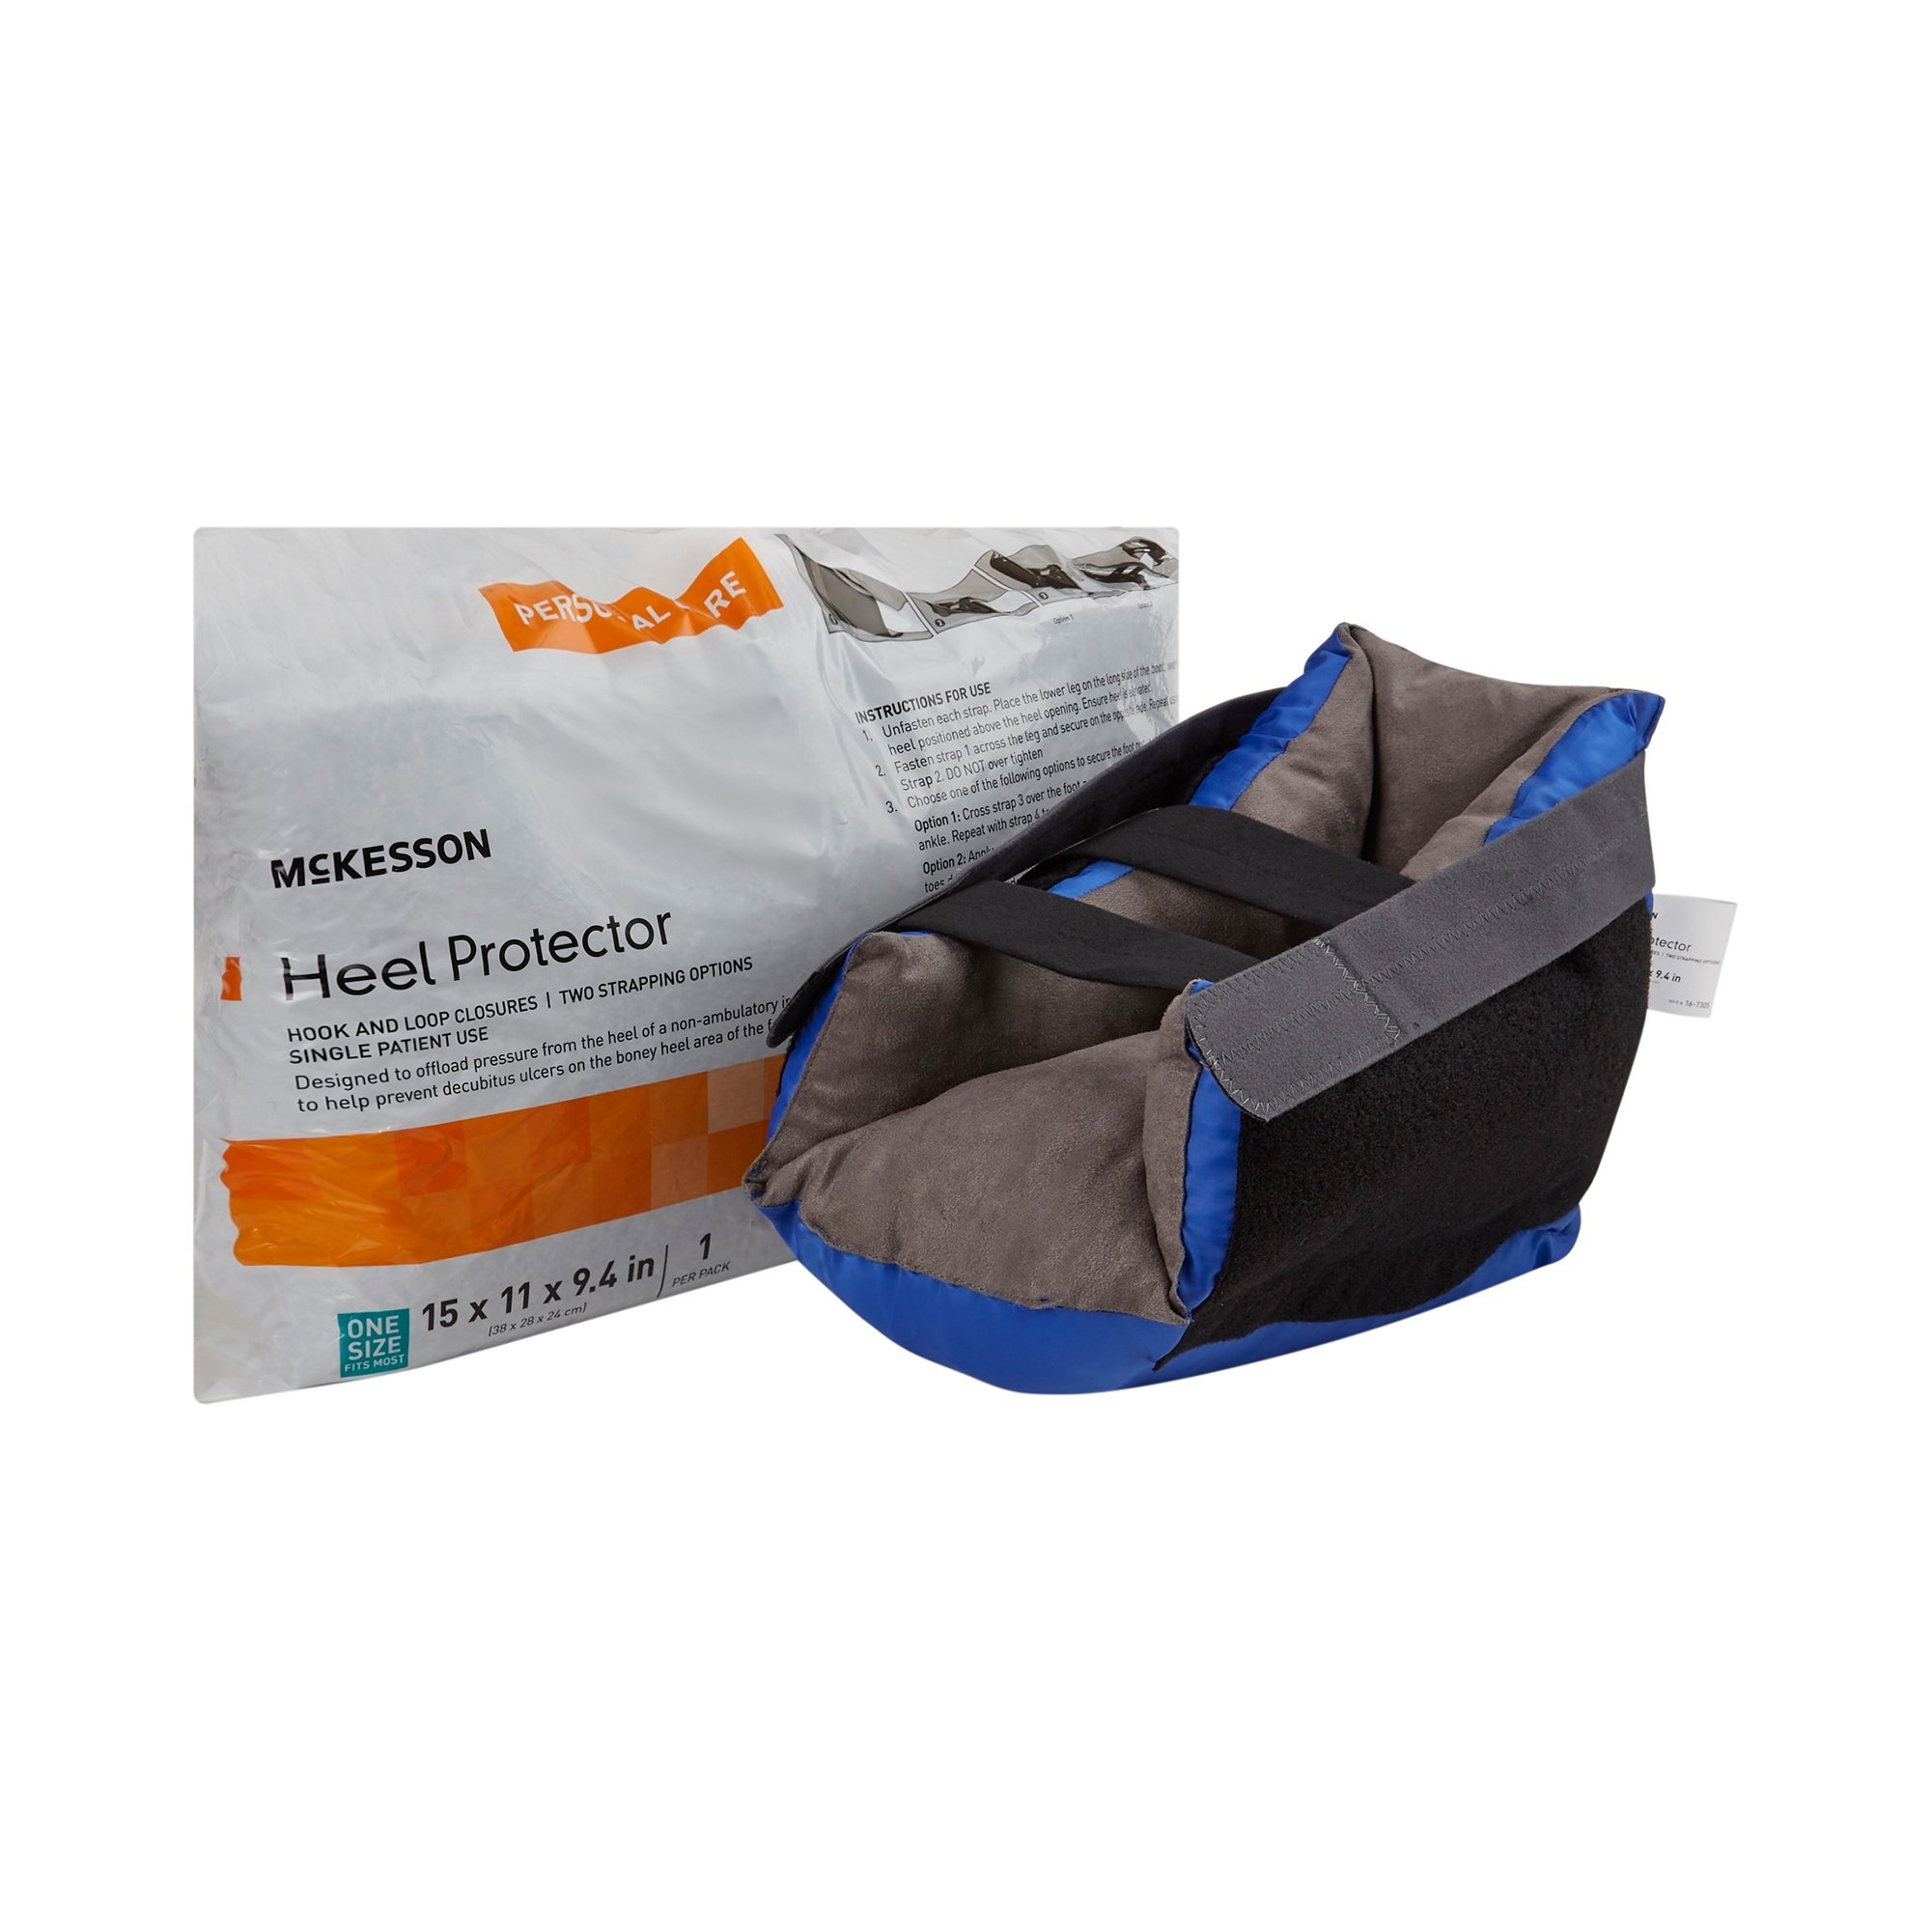 McKesson Heel Protector, 16-7305, 1 Each